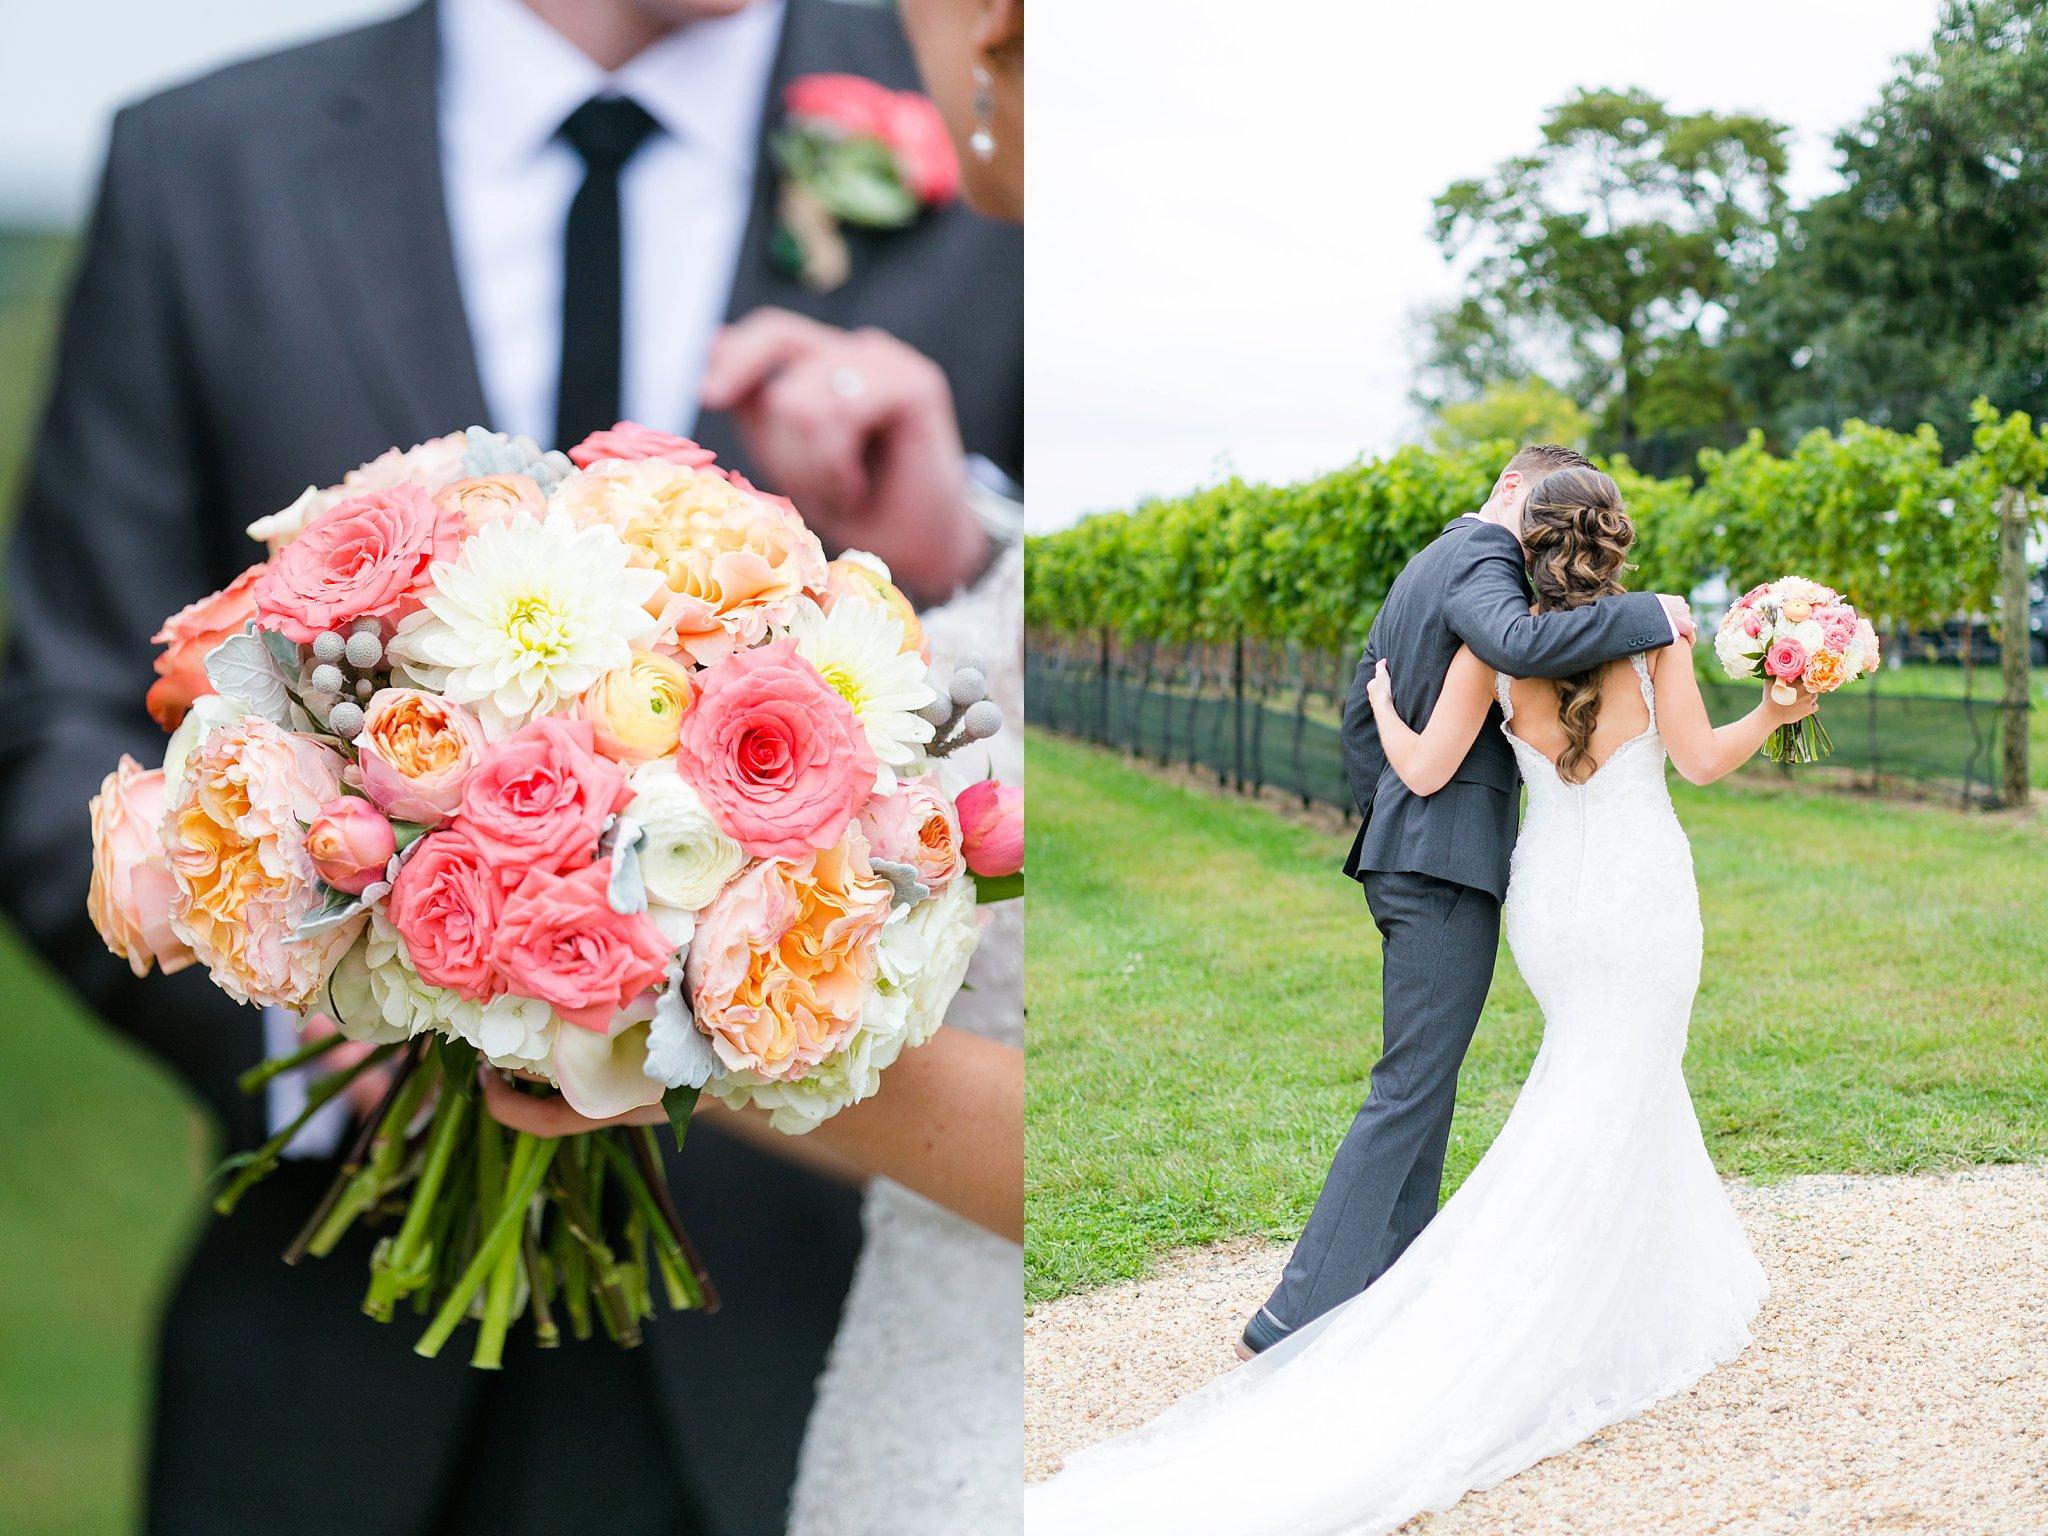 Stone Tower Winery Wedding Photos Virginia Wedding Photographer Megan Kelsey Photography Sam & Angela-178.jpg